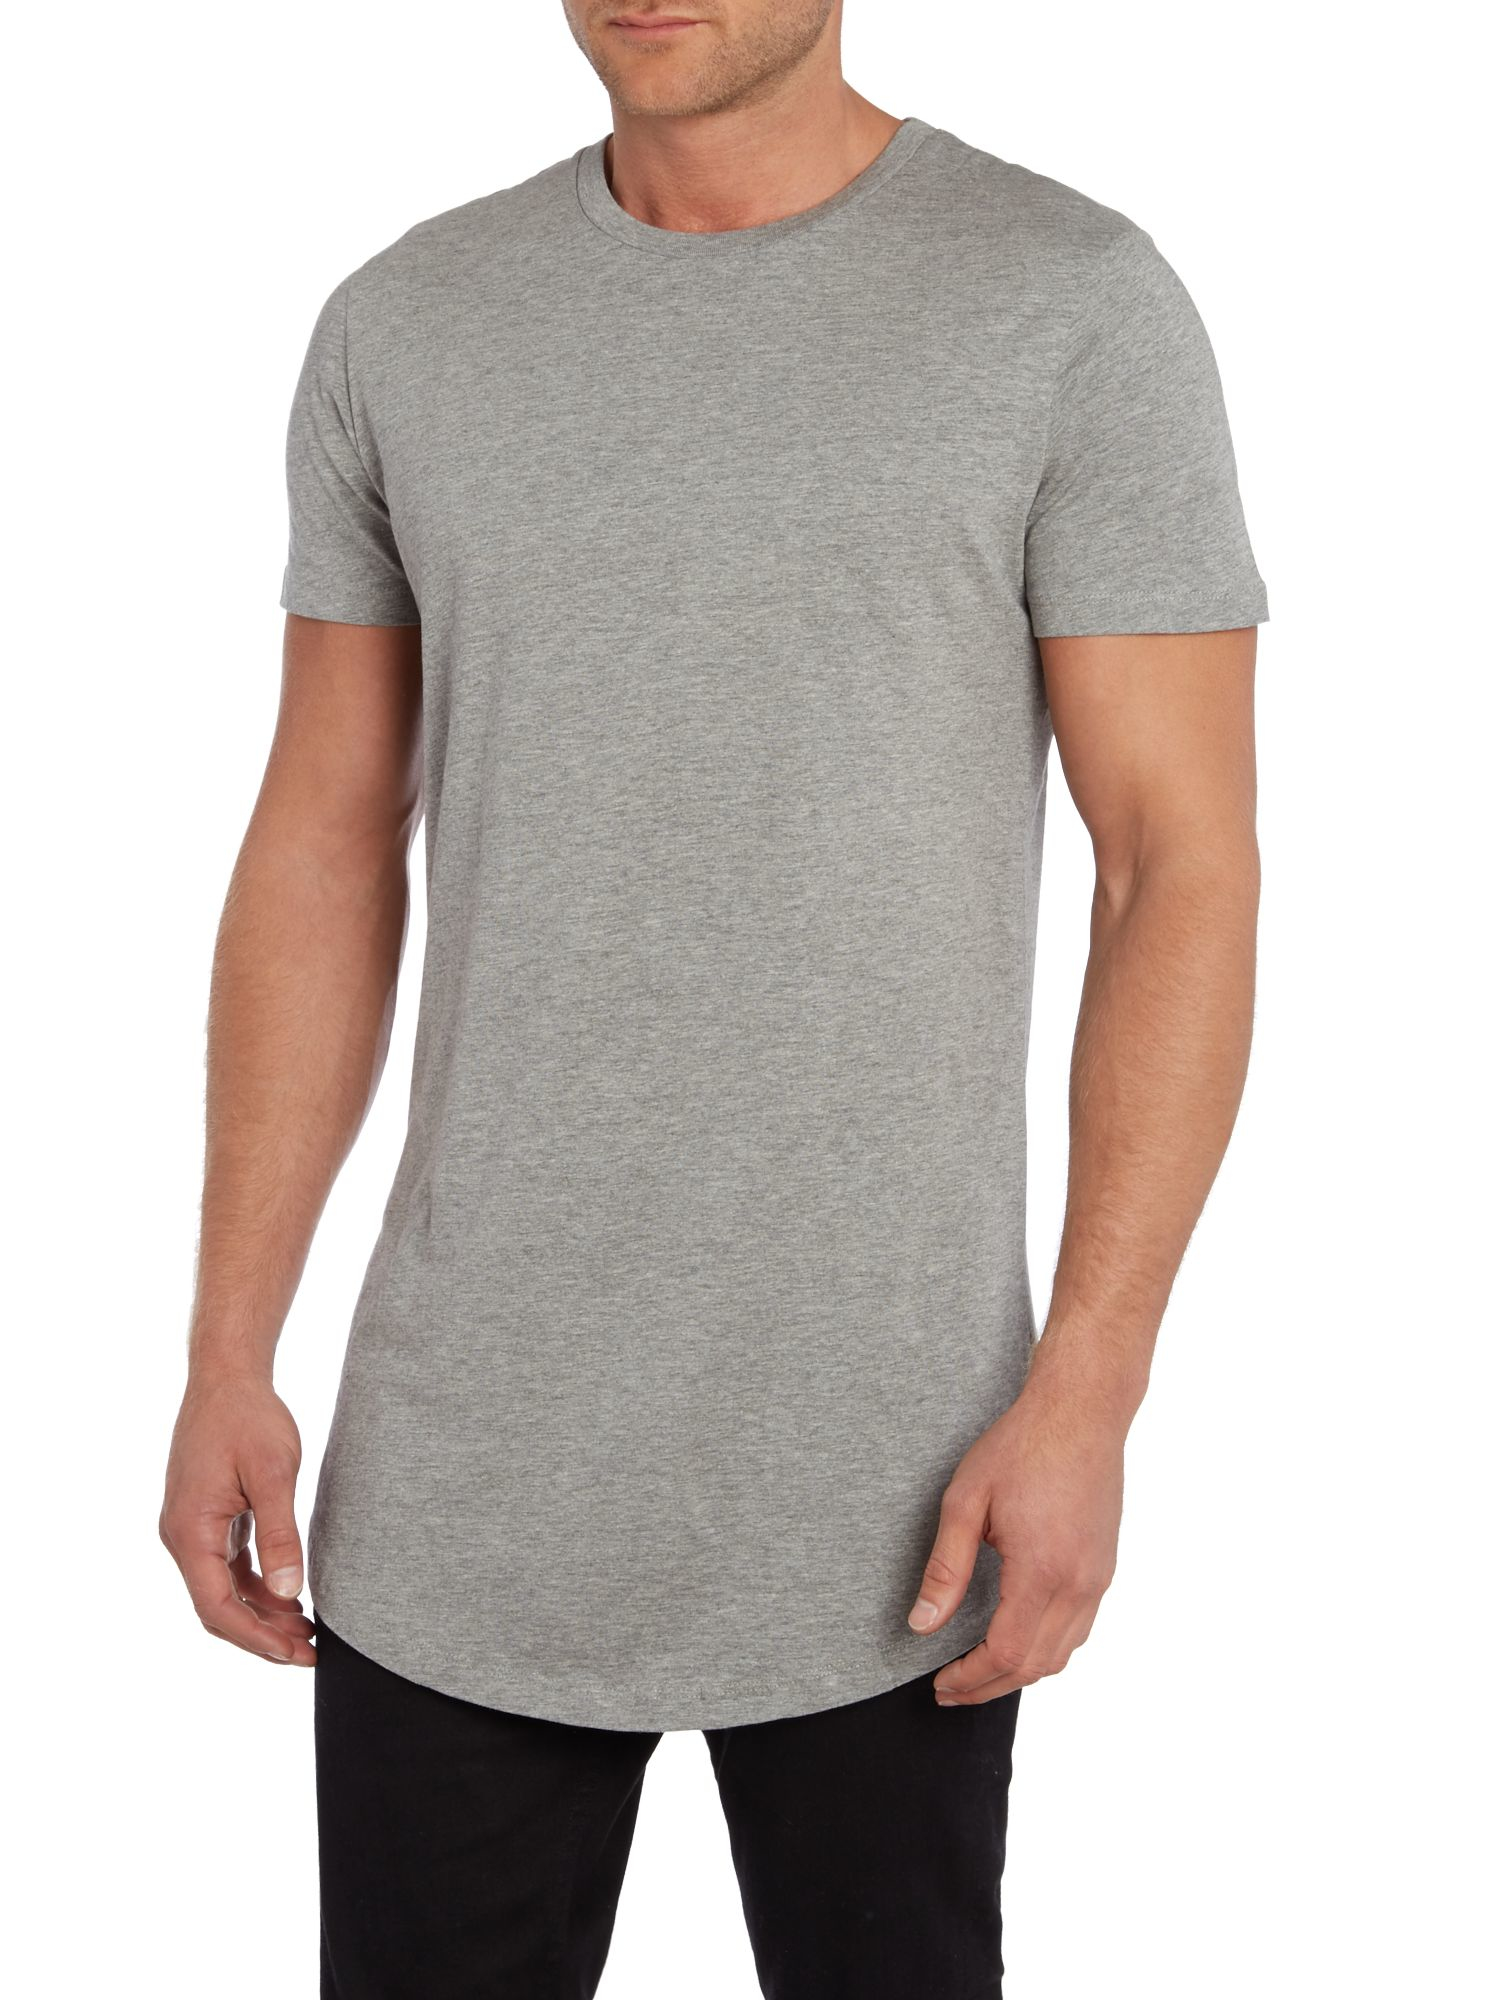 Plain grey long sleeve shirt greek t shirts for Grey long sleeve shirts